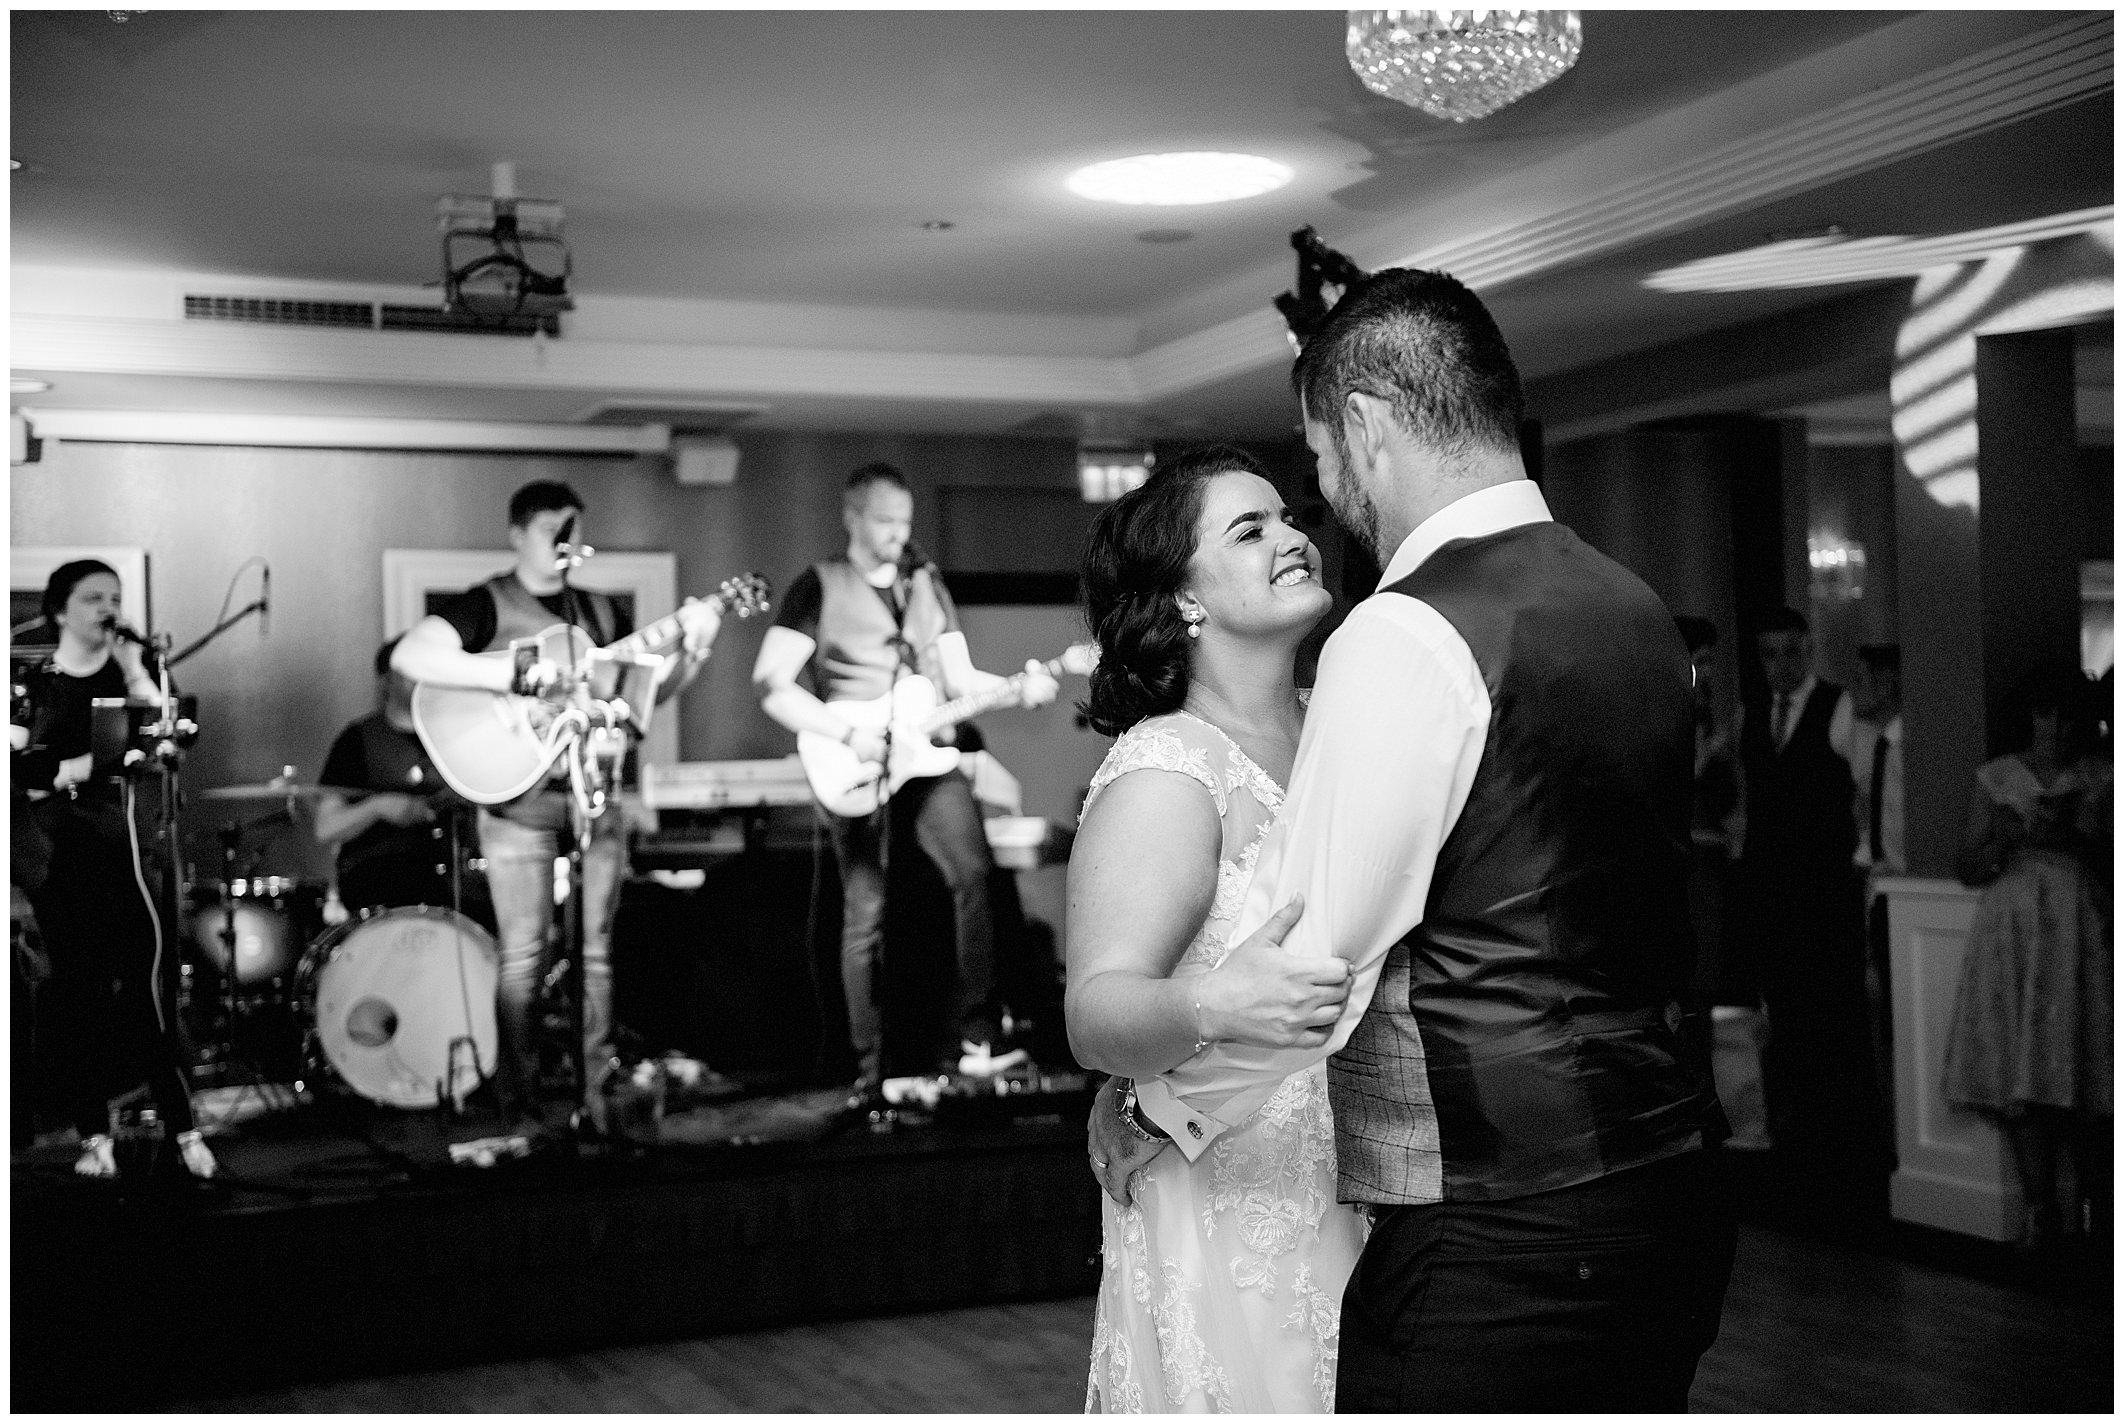 redcastle-hotel-wedding-karen-brian-jude-browne-photography-142.jpg